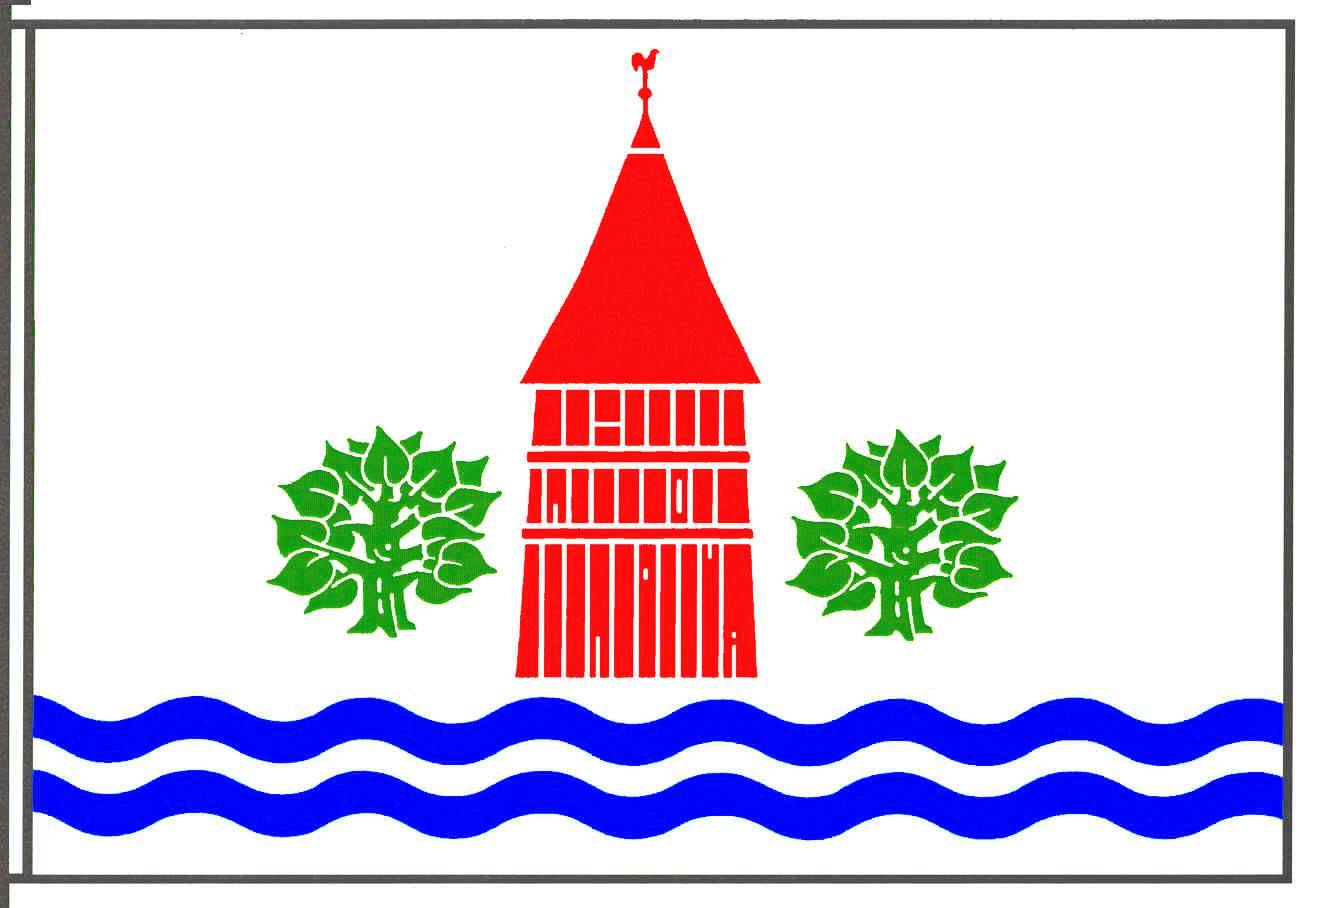 Flagge GemeindeLeezen, Kreis Segeberg